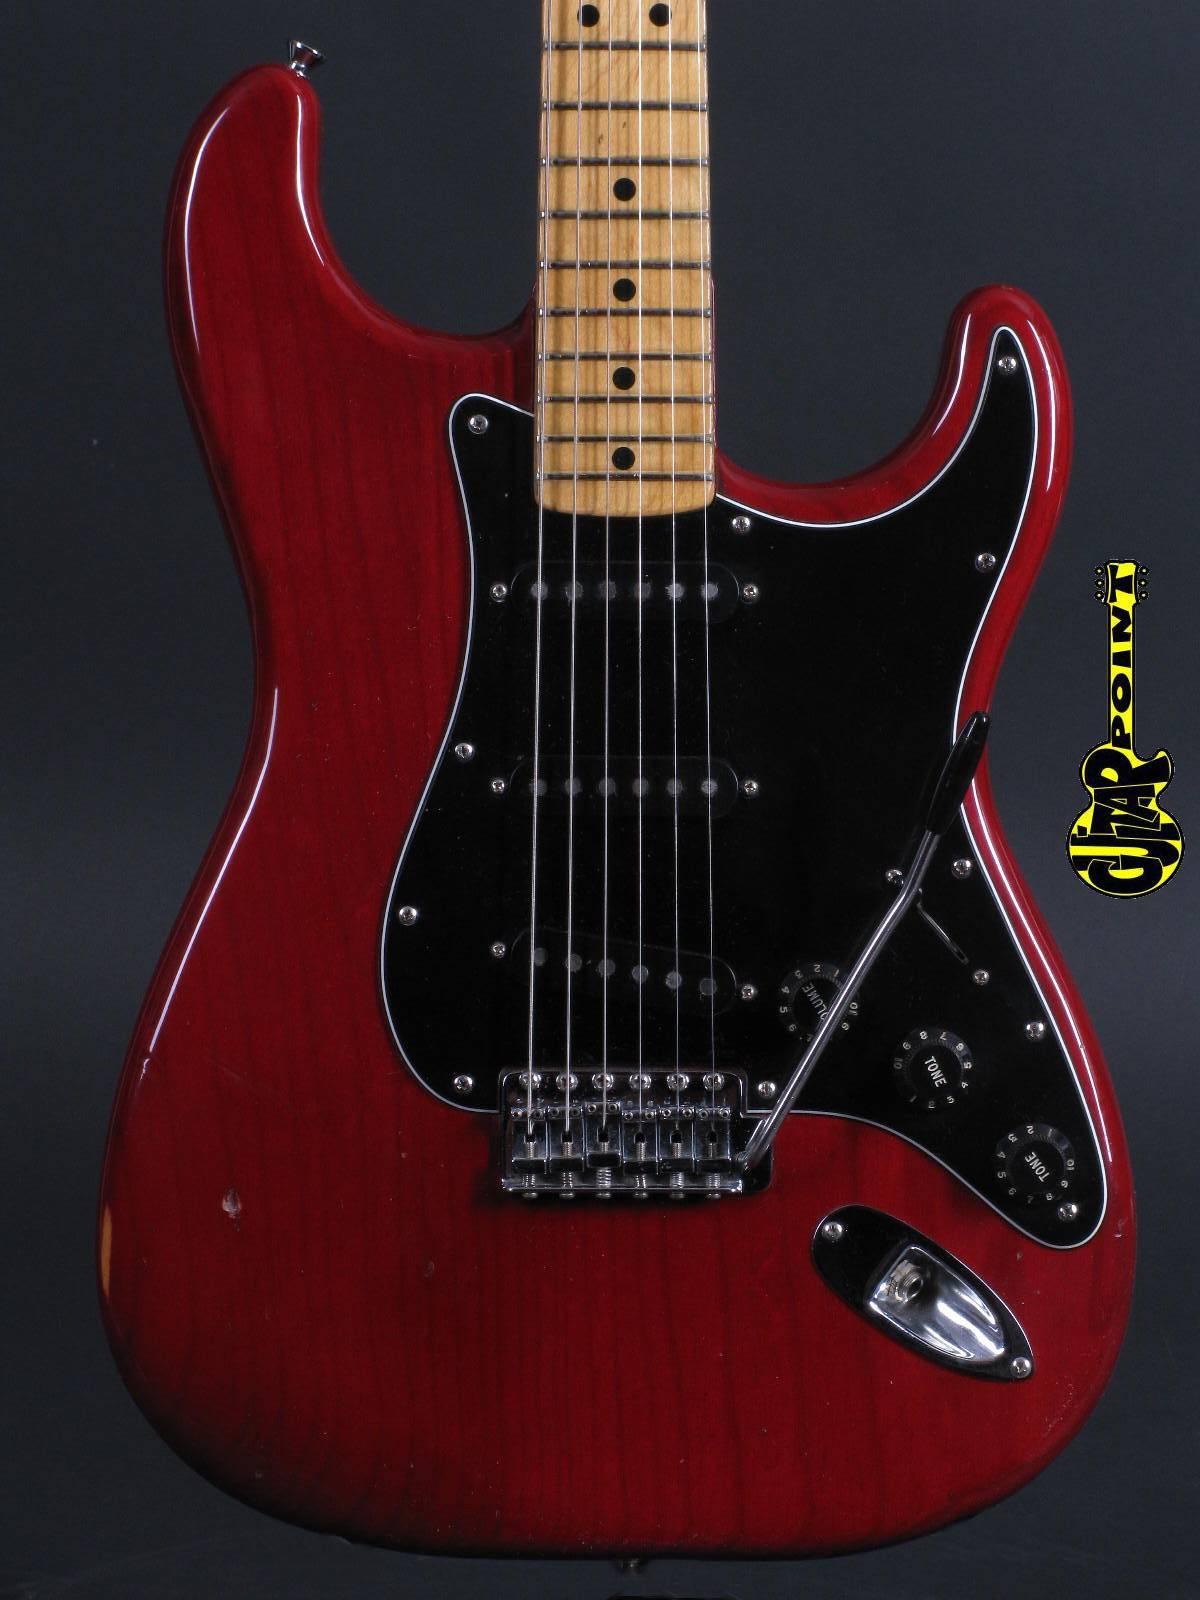 1979 Fender Stratocaster - Winered